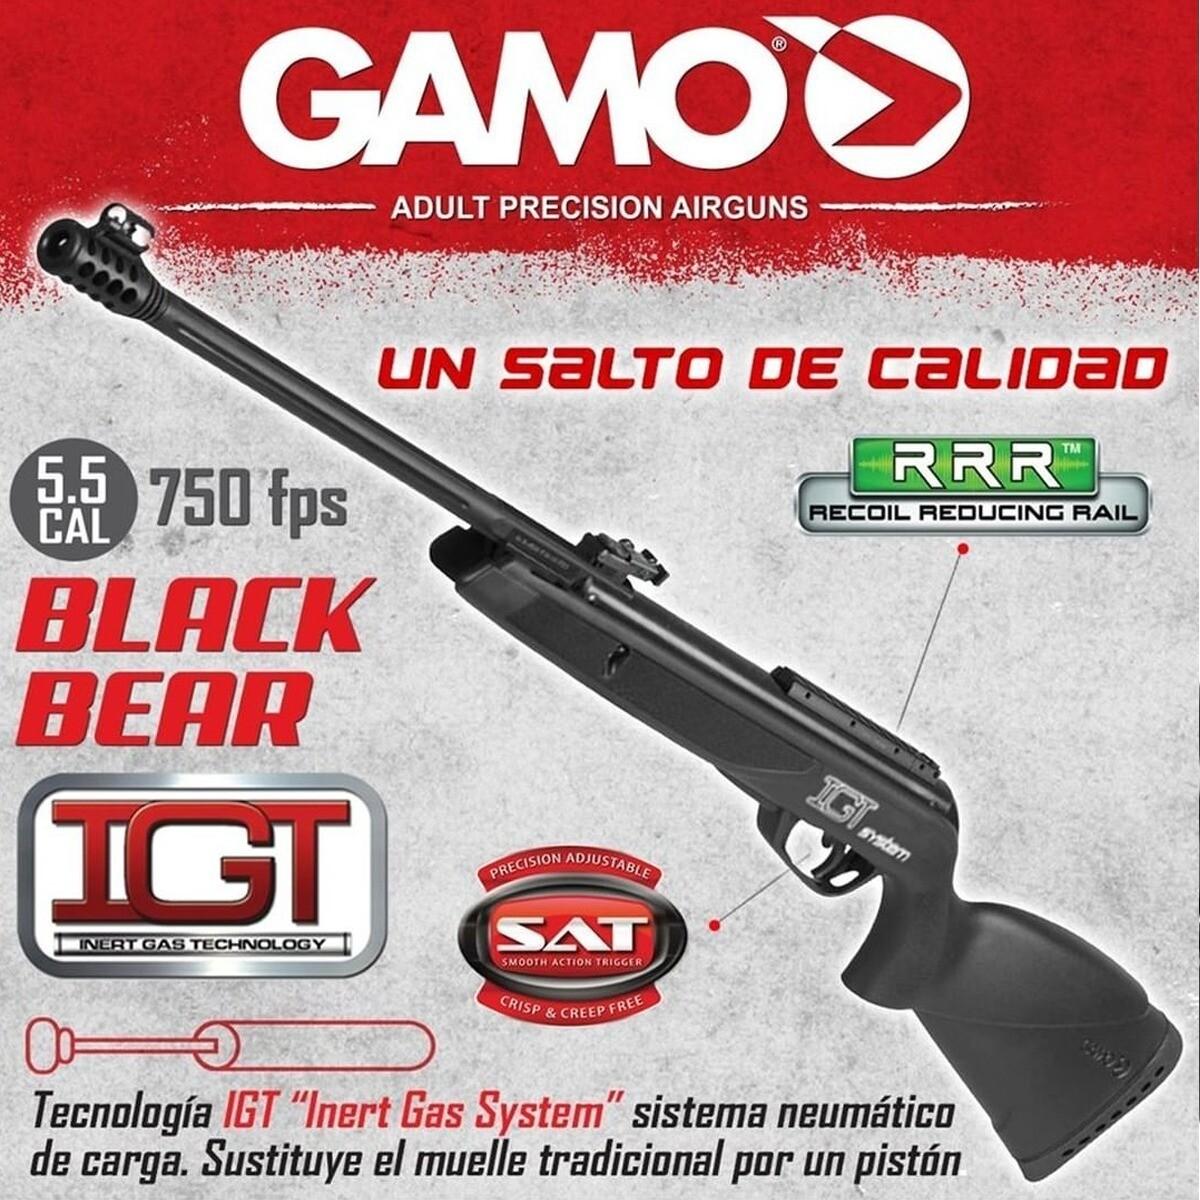 RIFLE GAMO BLACK BEAR 5.5 IGT